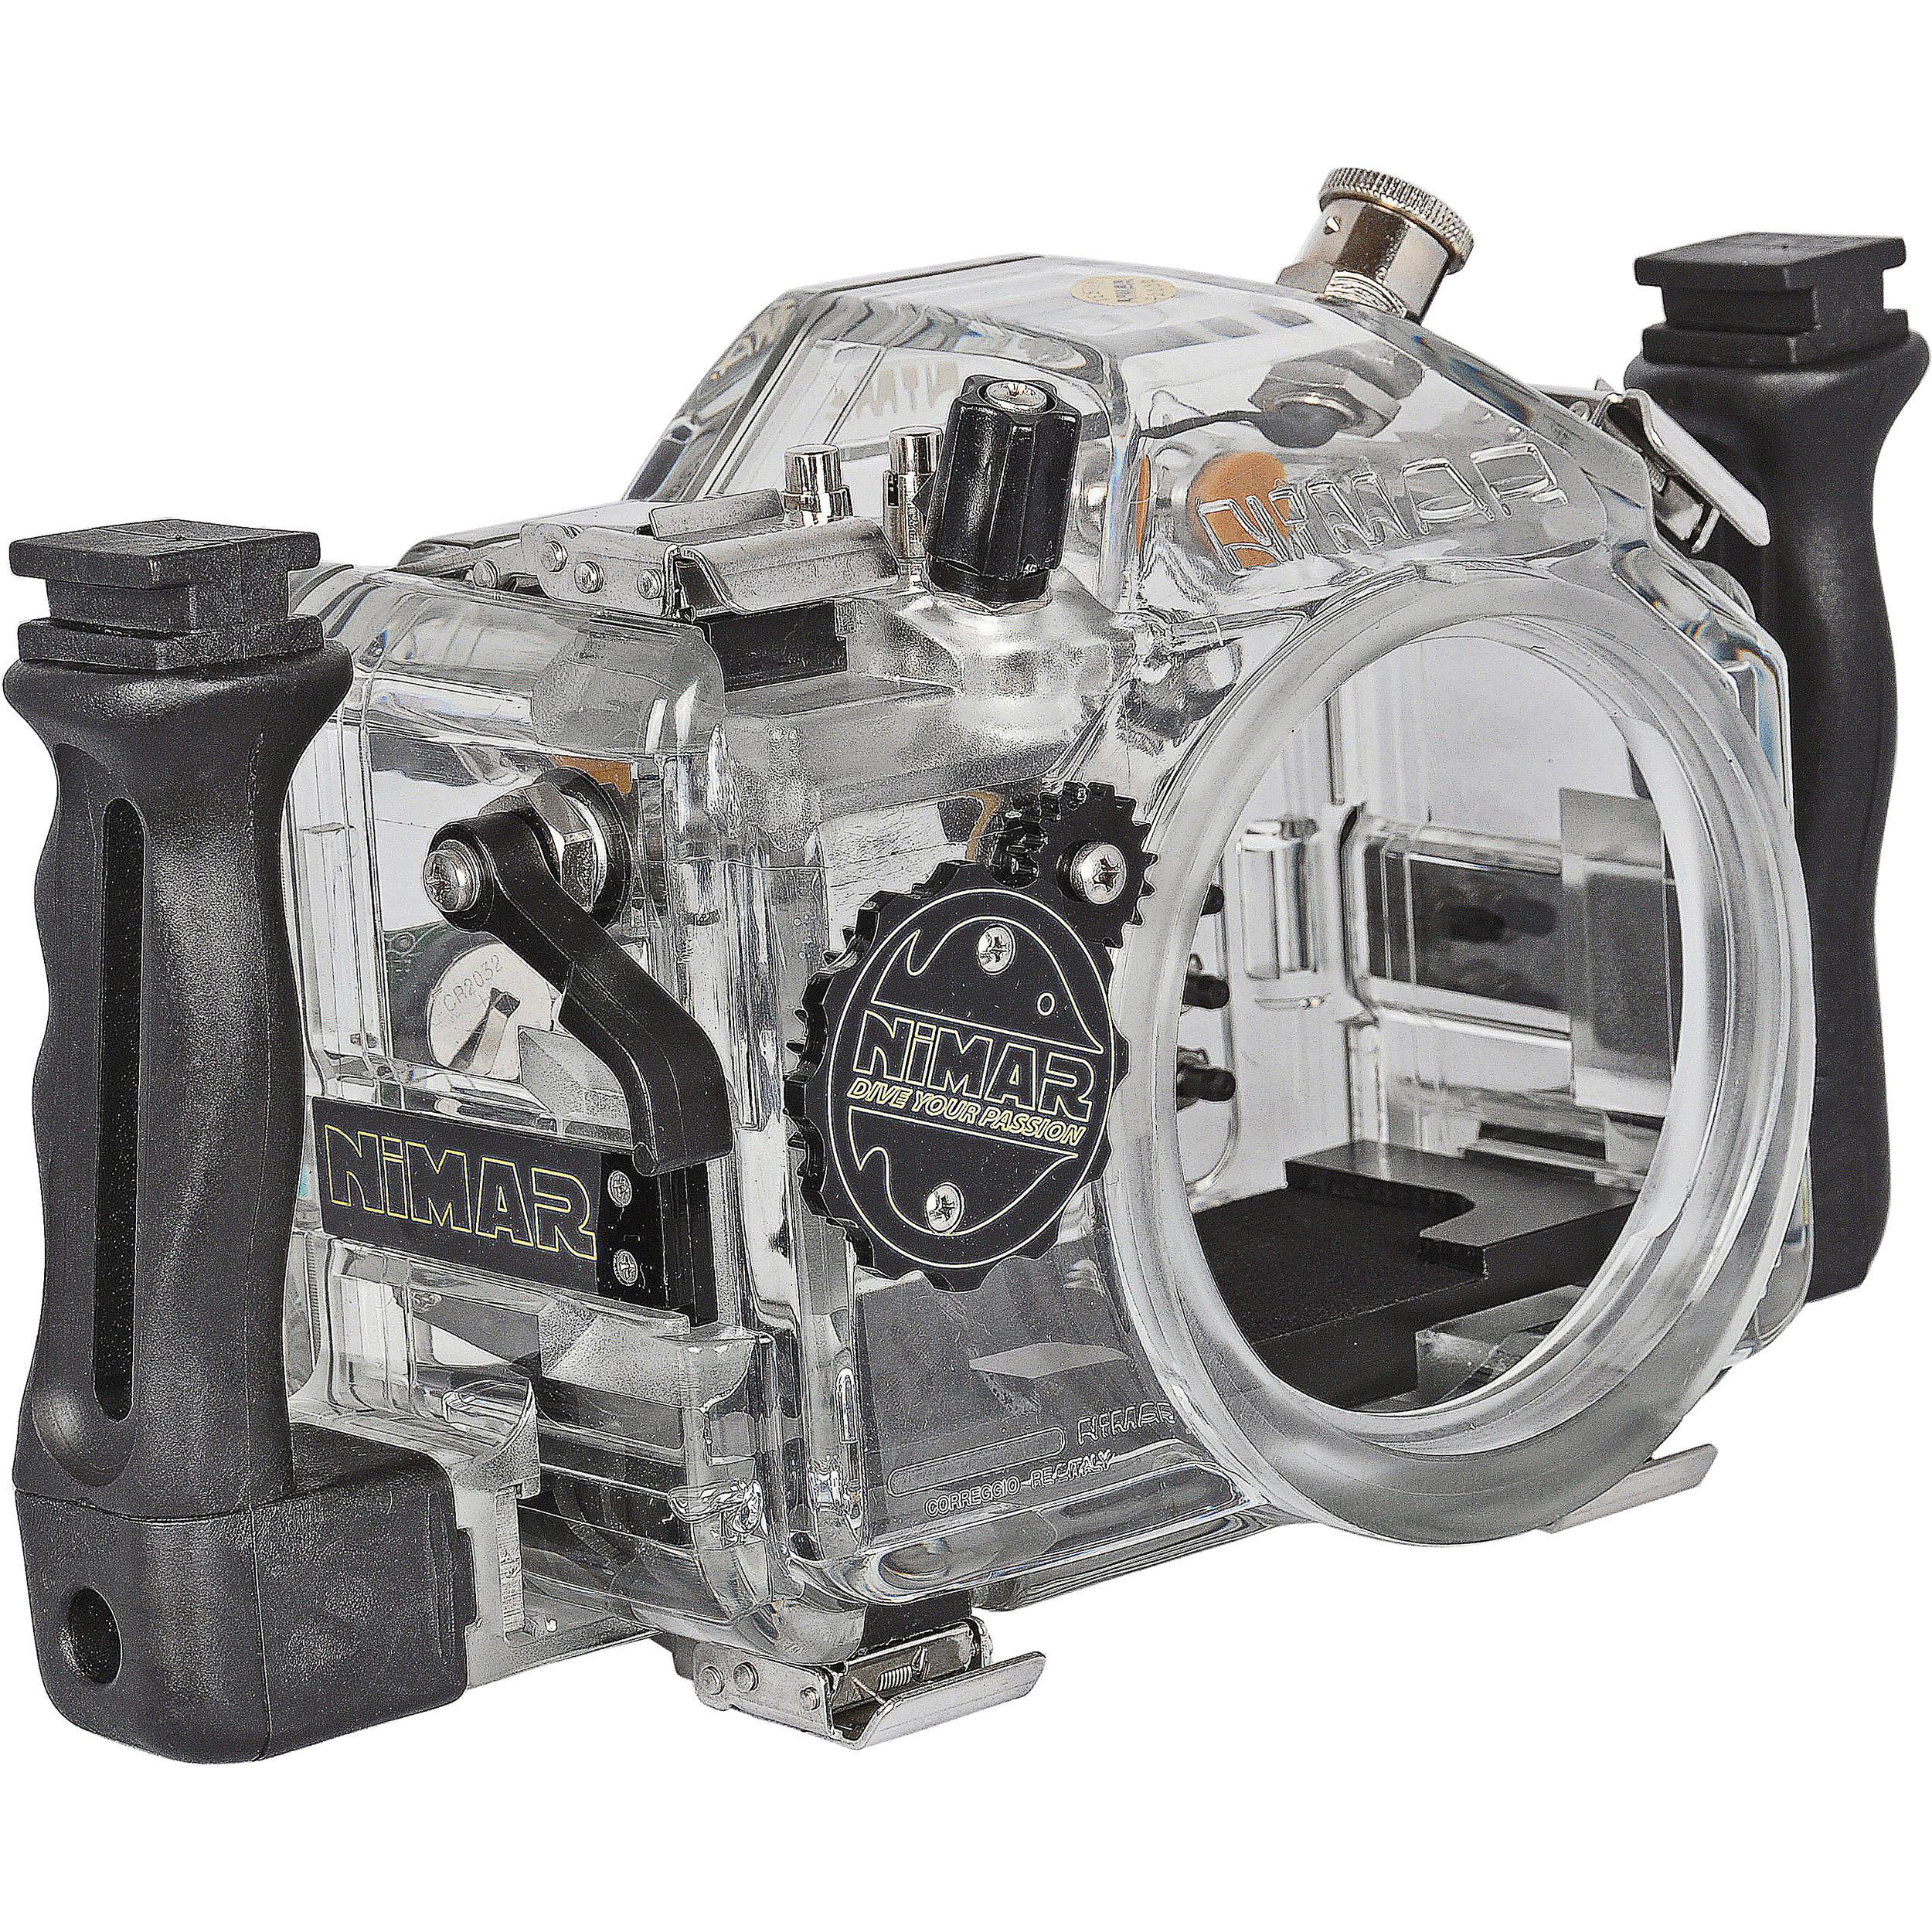 Nimar Underwater Housing for Canon EOS 400D (No Port)